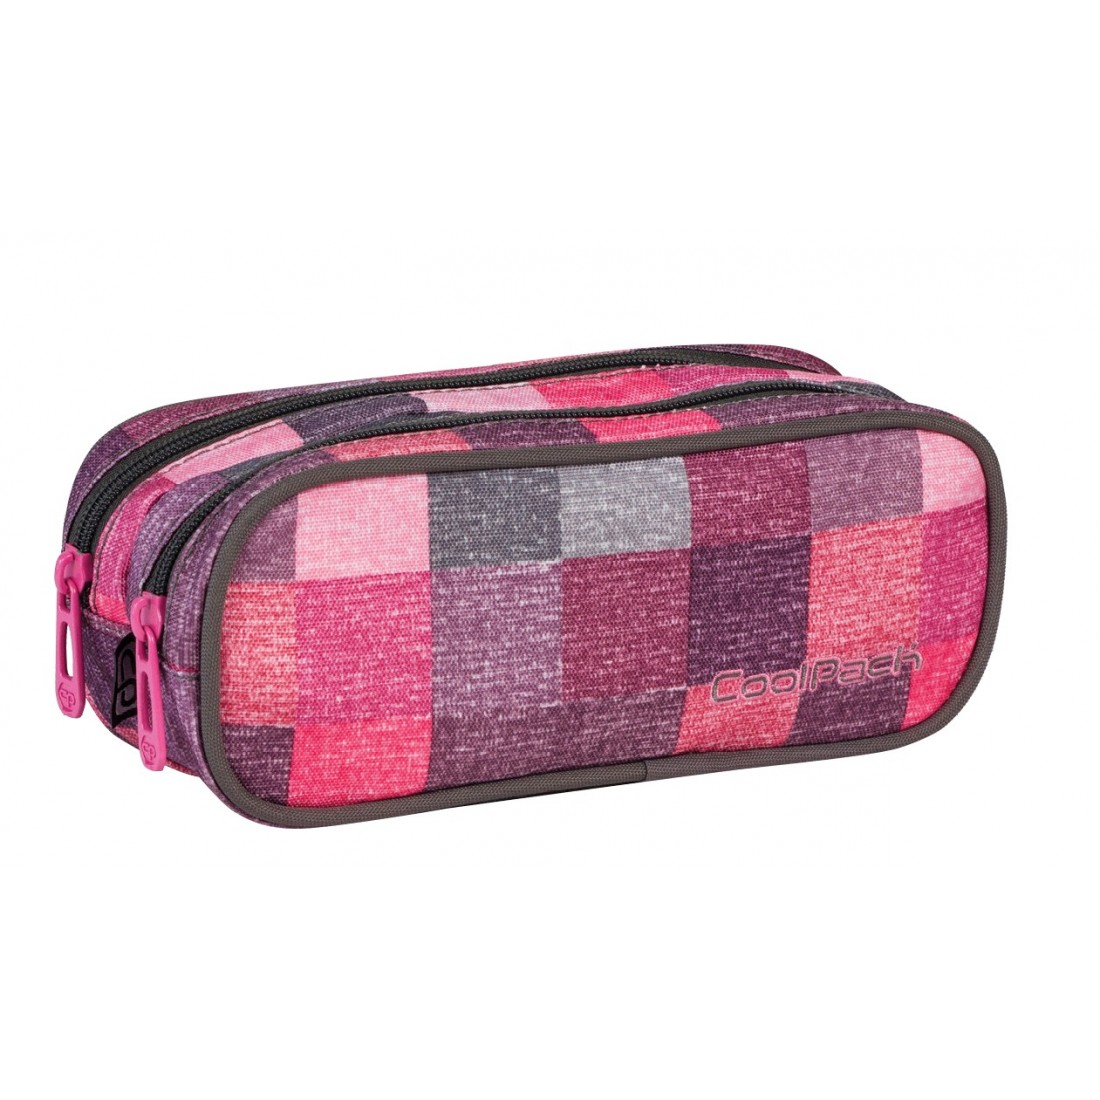 Saszetka podwójna CoolPack CLEVER ROSE SHADES CP 410 - plecak-tornister.pl